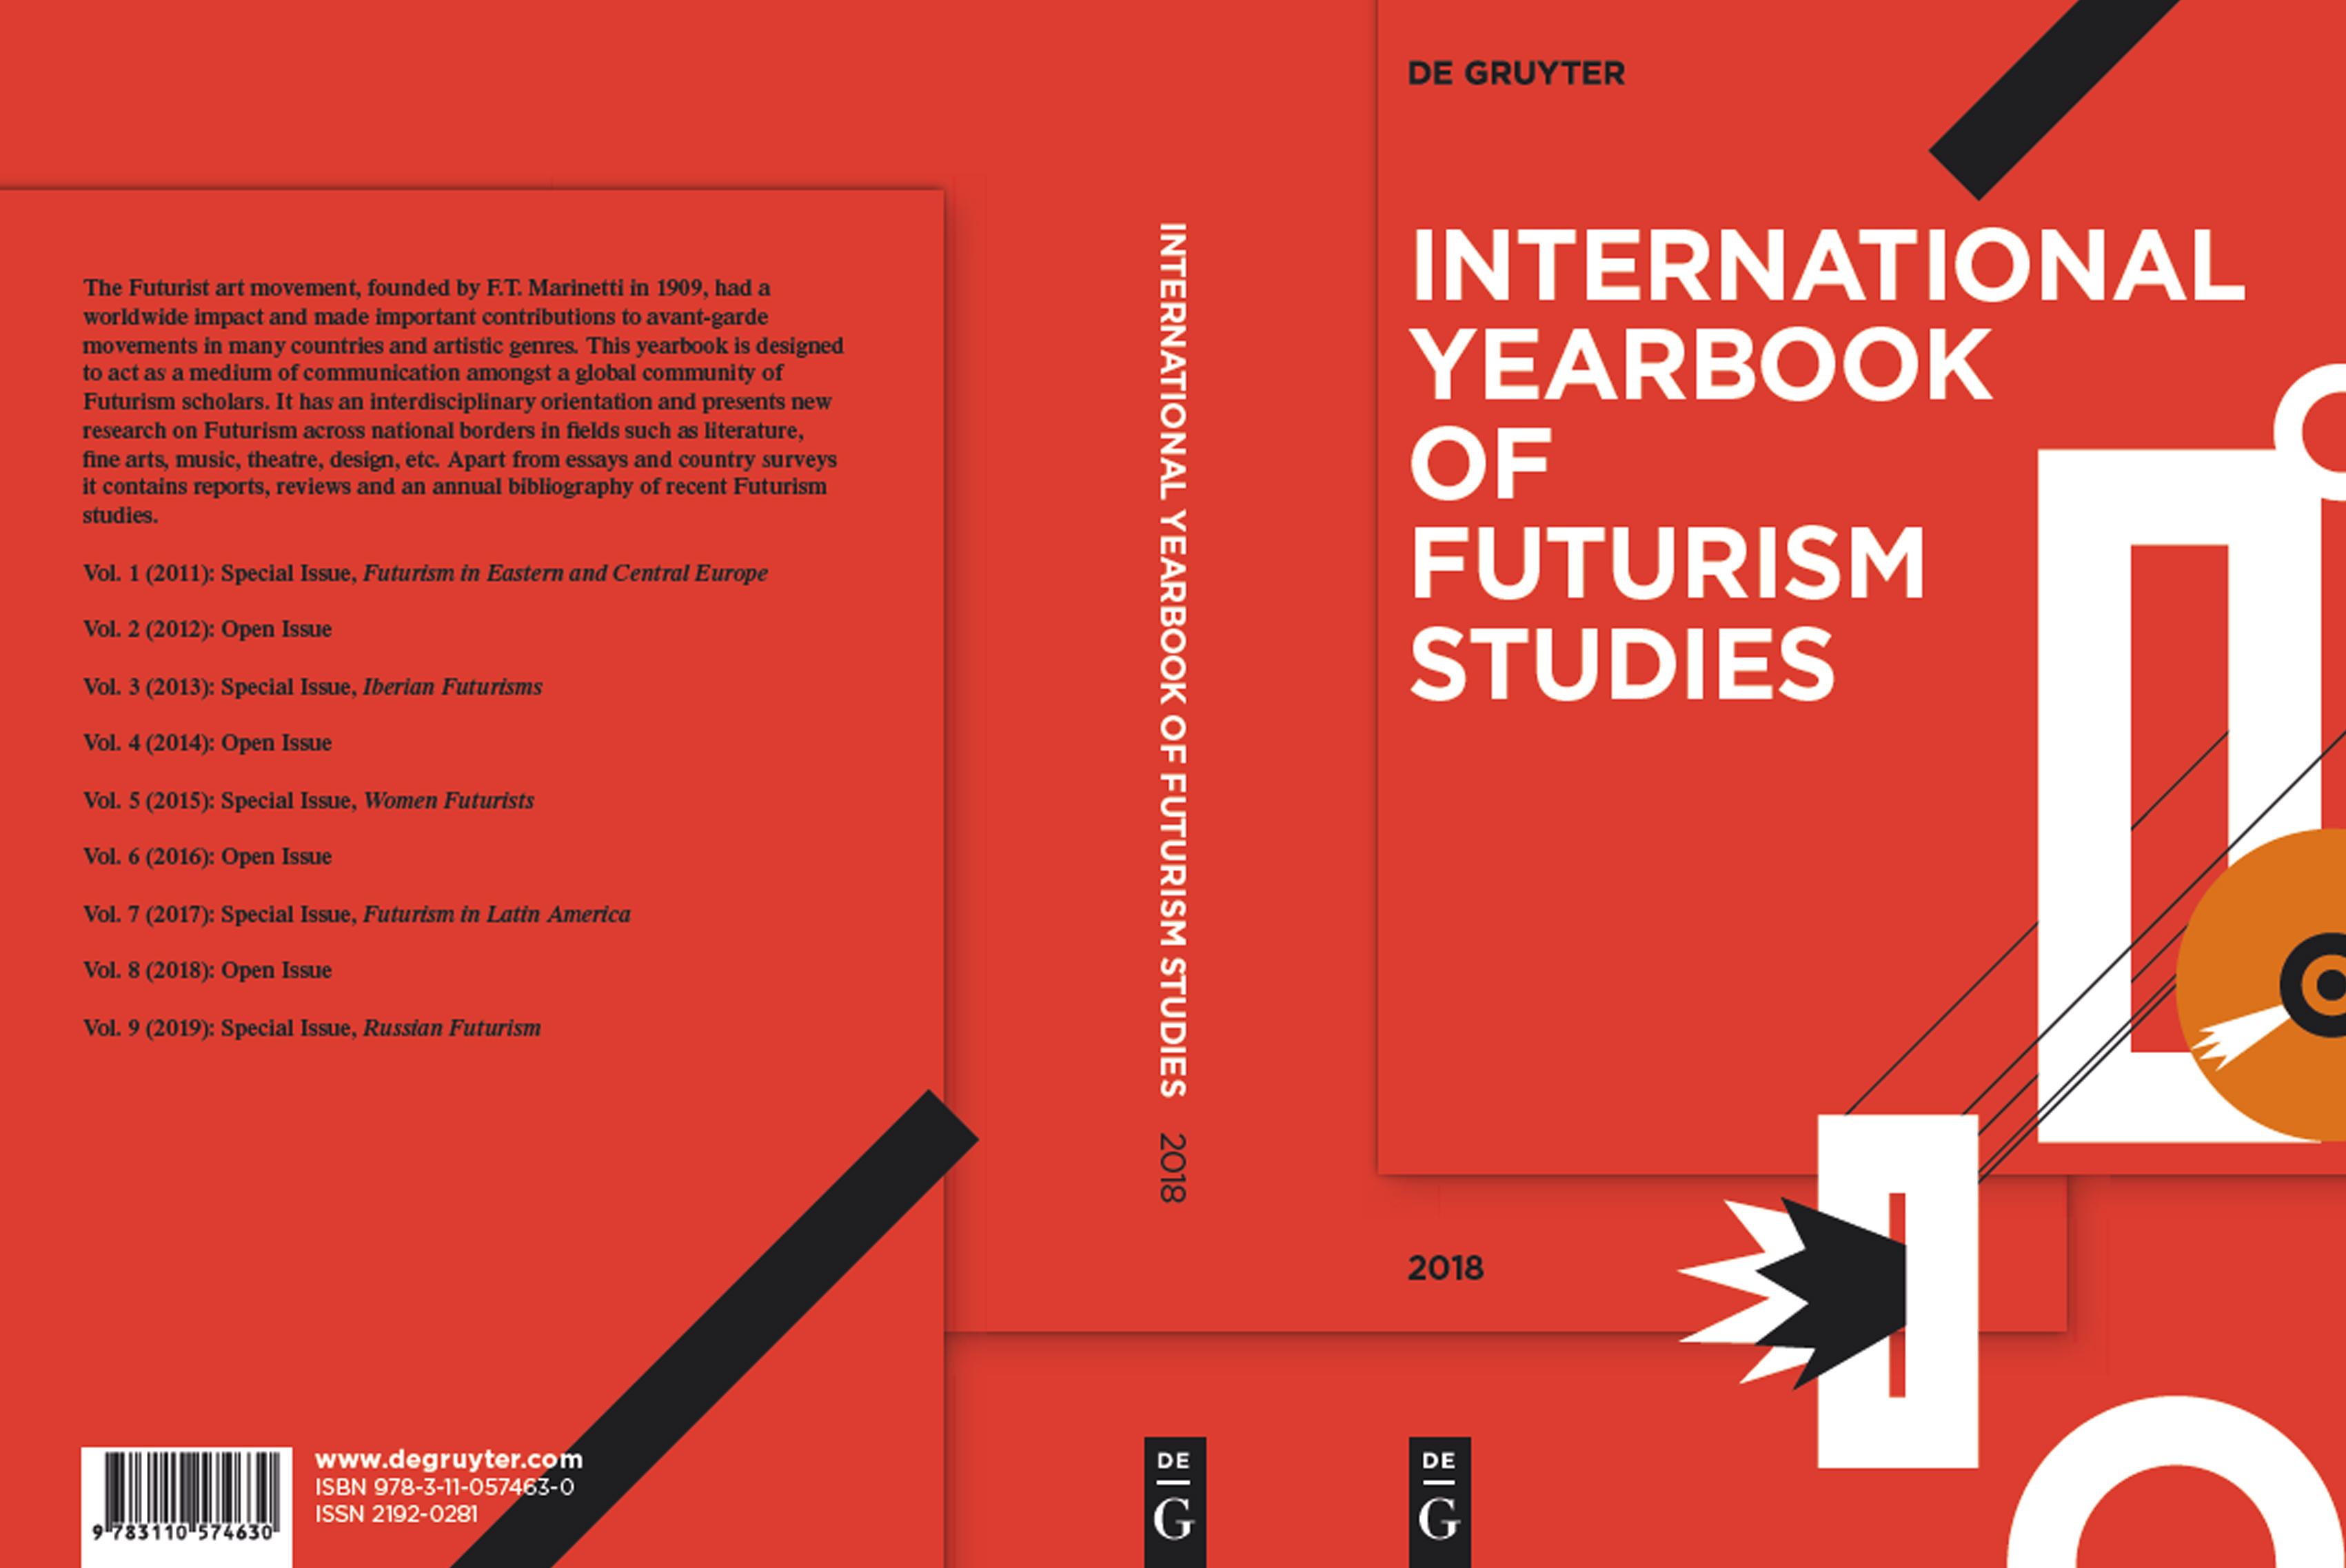 2018 Yearbook 1  cover.jpg